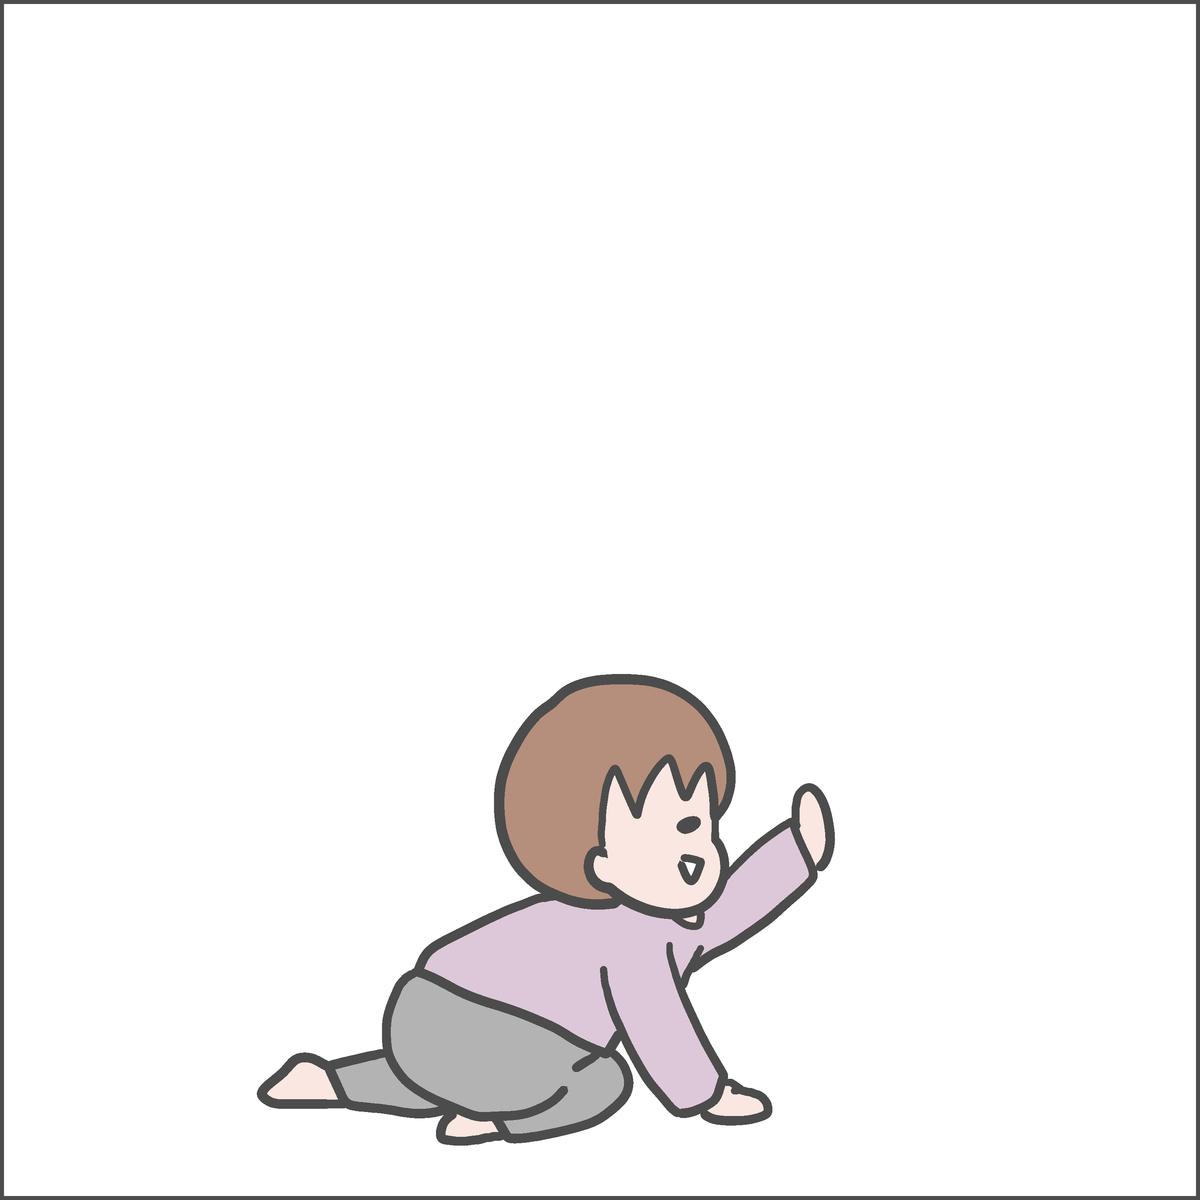 f:id:ika_yoshi:20201219224421j:plain